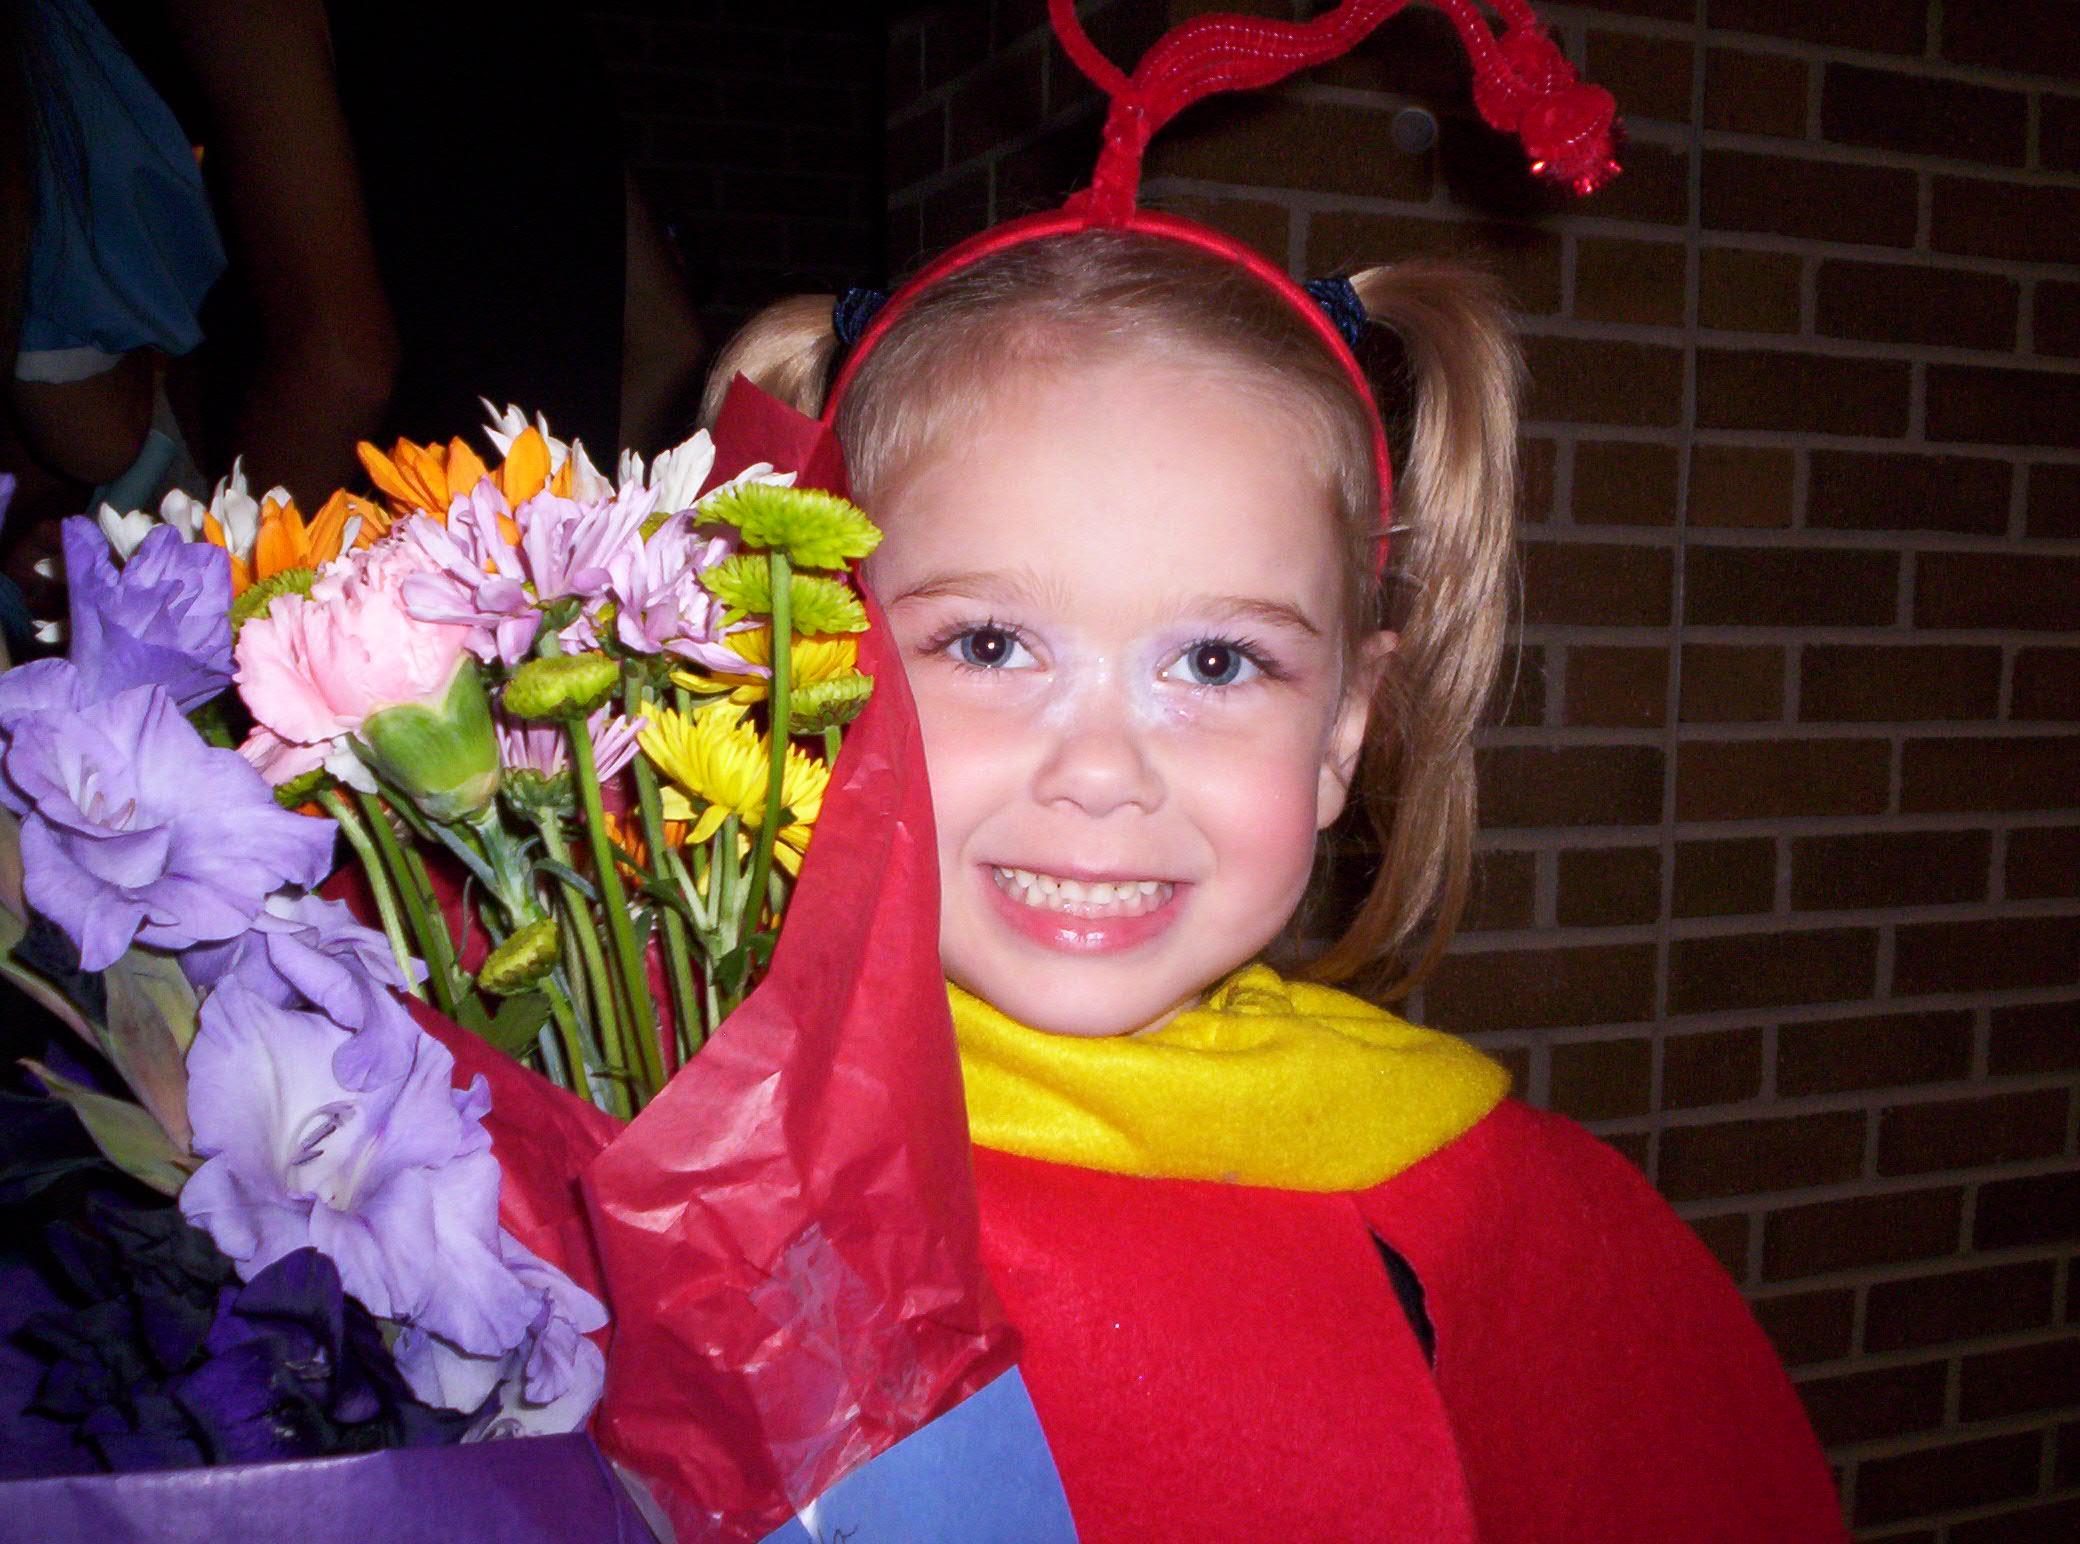 Princess as a dancing flower.